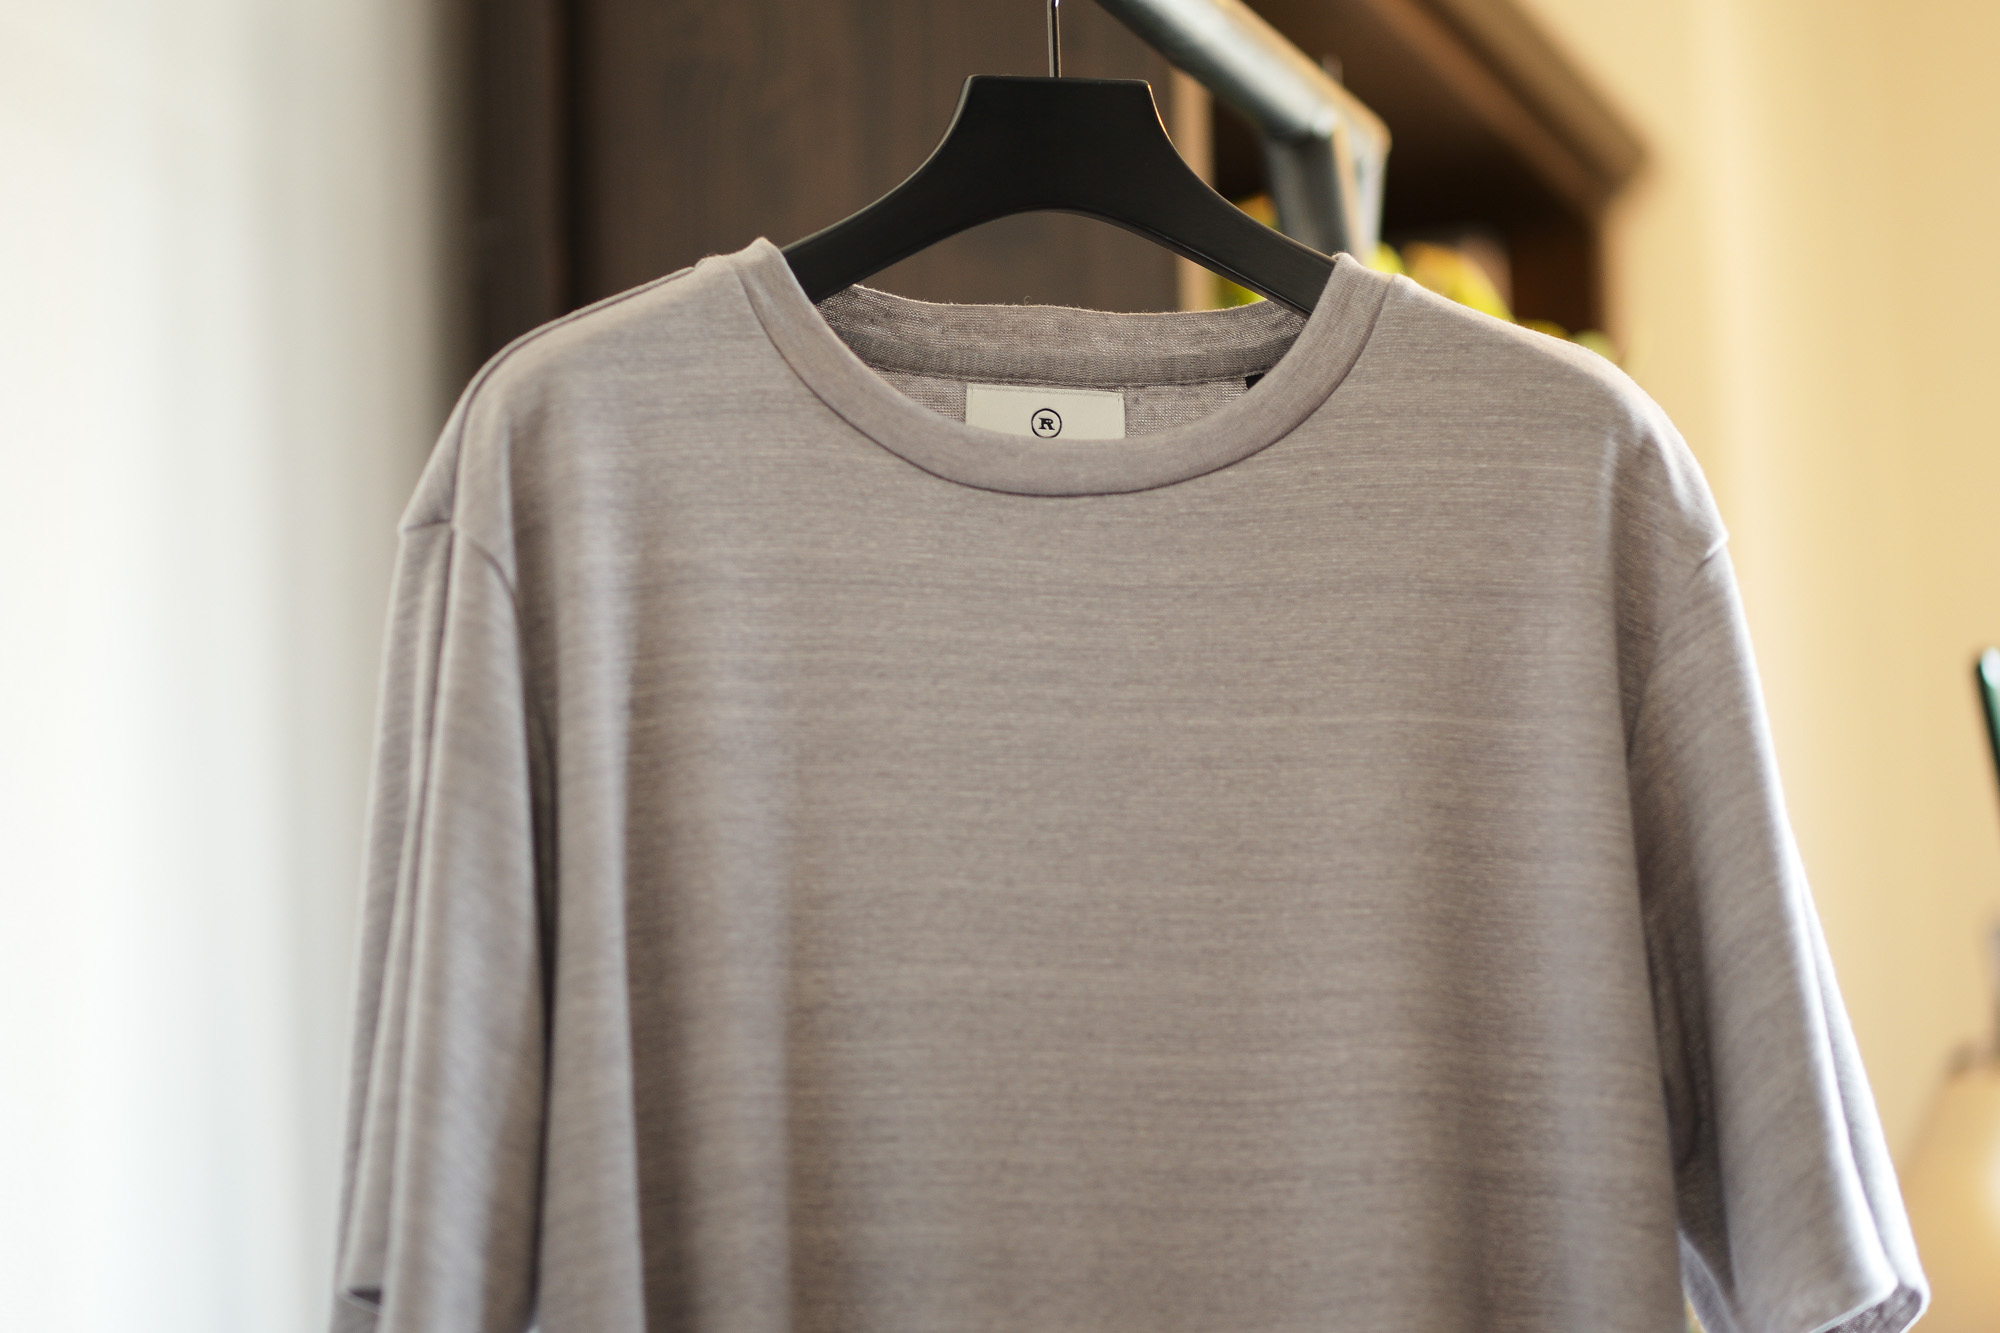 RIVORA / リヴォラ (2021 春夏 展示会) Spring Summer Collection R23-MUT001 Vintage Linen Layered T-Shirts リネン100 カットソー Tシャツ 栗生田弓 YUMIAOTA altoediritto アルトエデリット ニット 二重カットソー 二重Tシャツ